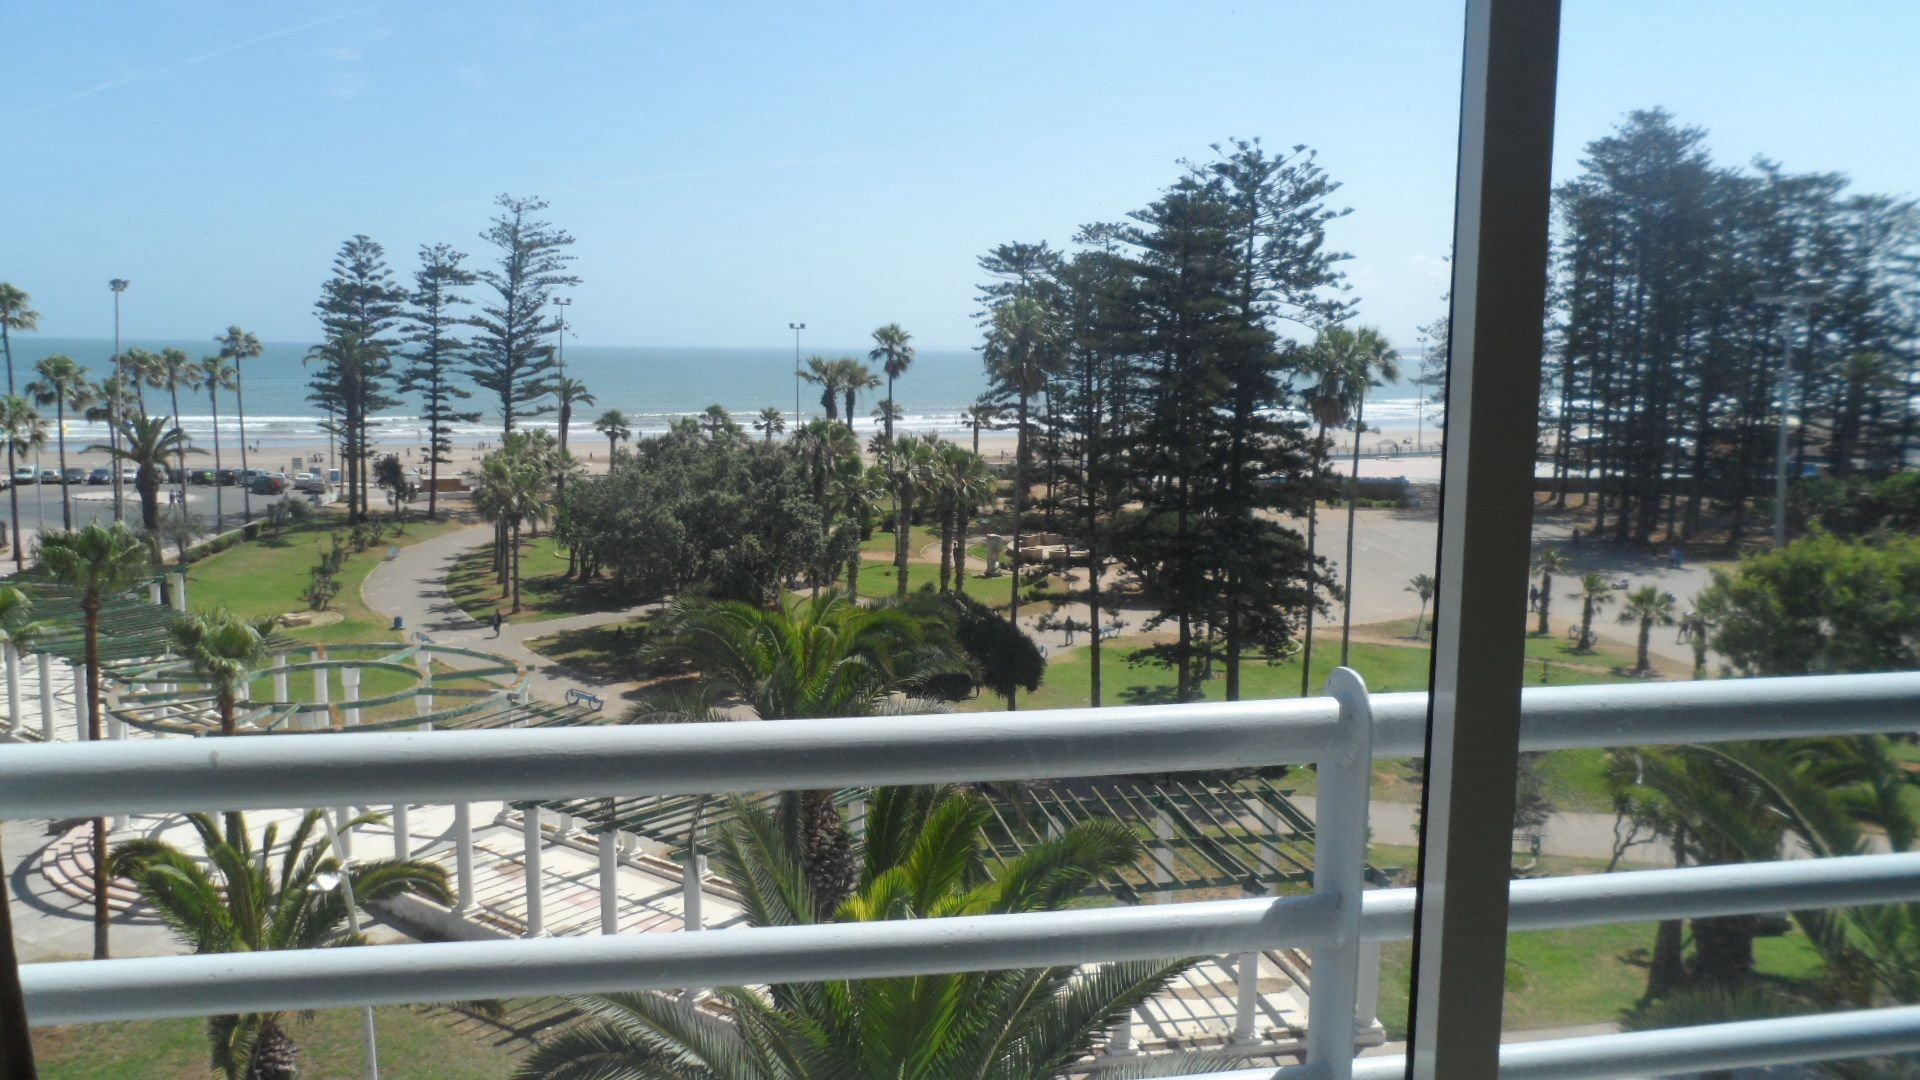 Appartement centre ville Vue sur Mer A8, El Jadida